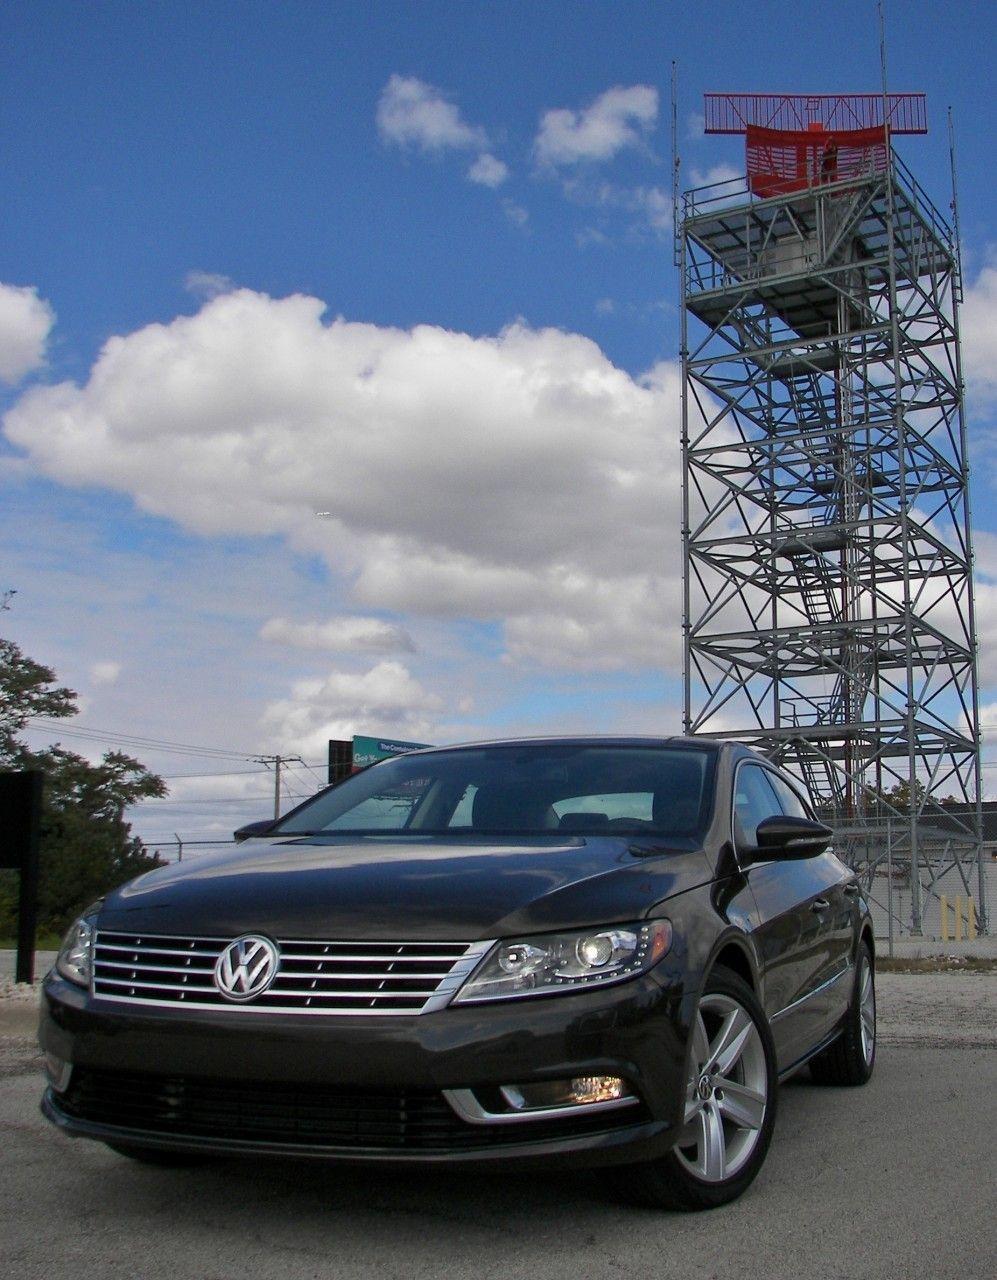 2013_VW_CC_Sport_100_9935_b vwcc Volkswagen cc, Vw cc